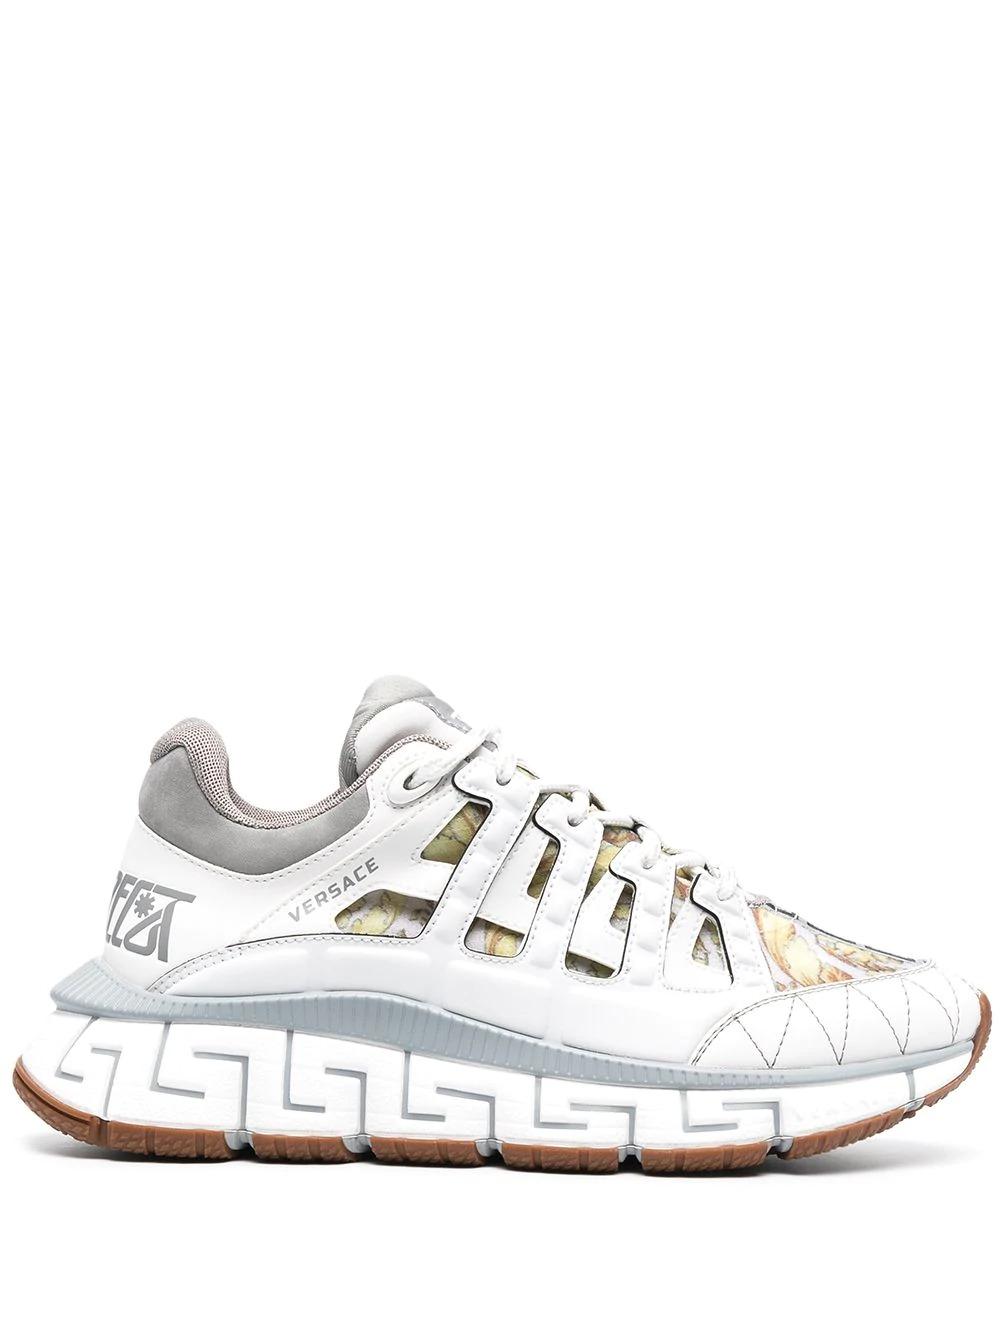 Trigreca Sneakers in Weiß